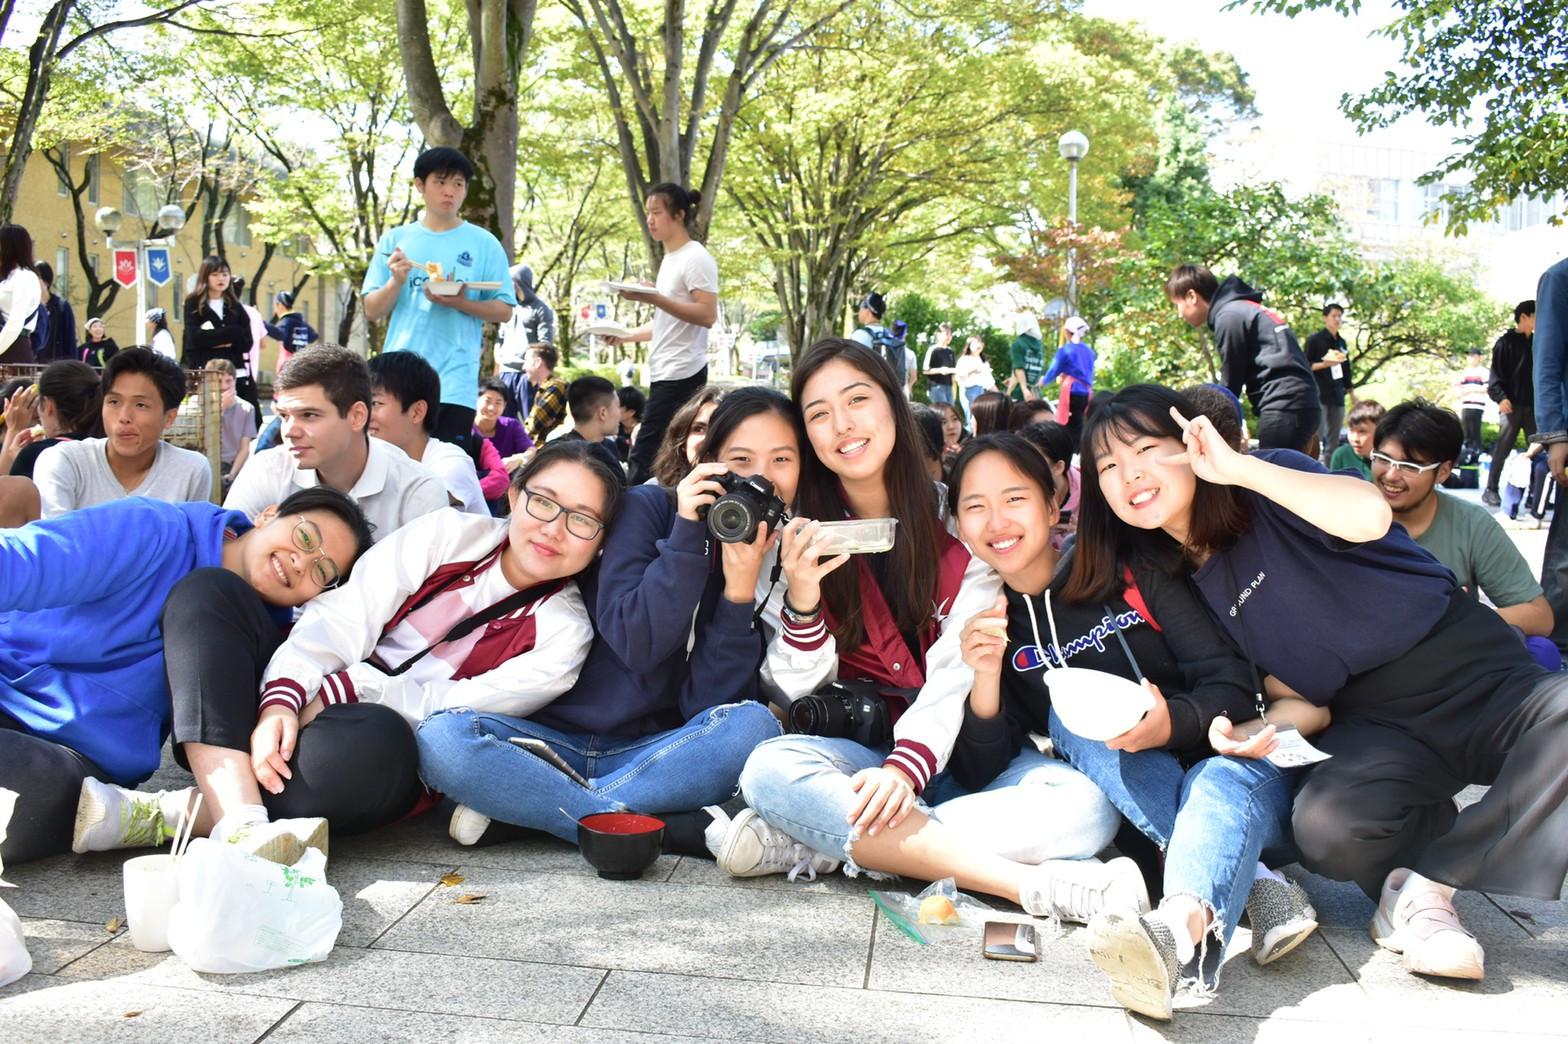 ryukitsu_2019 (38).jpg